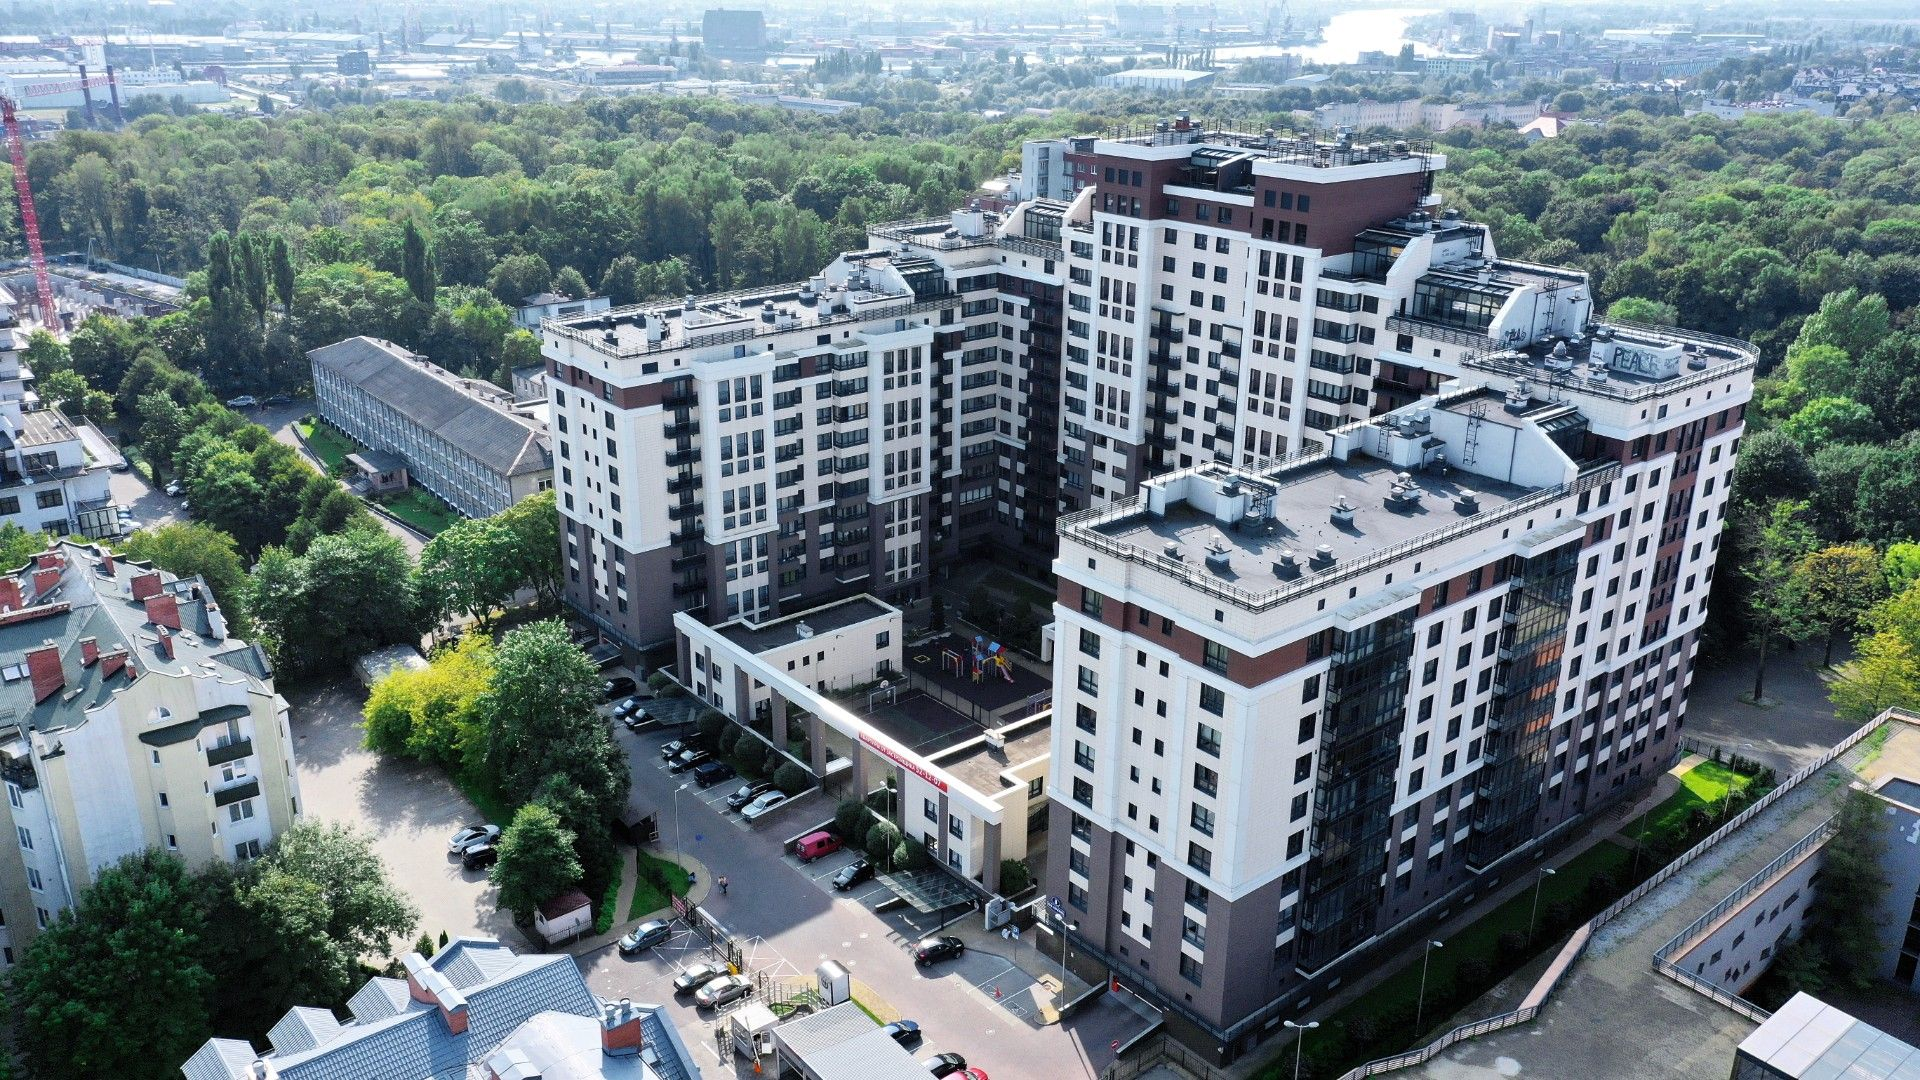 жилой комплекс Karlshof (Карлсхоф)